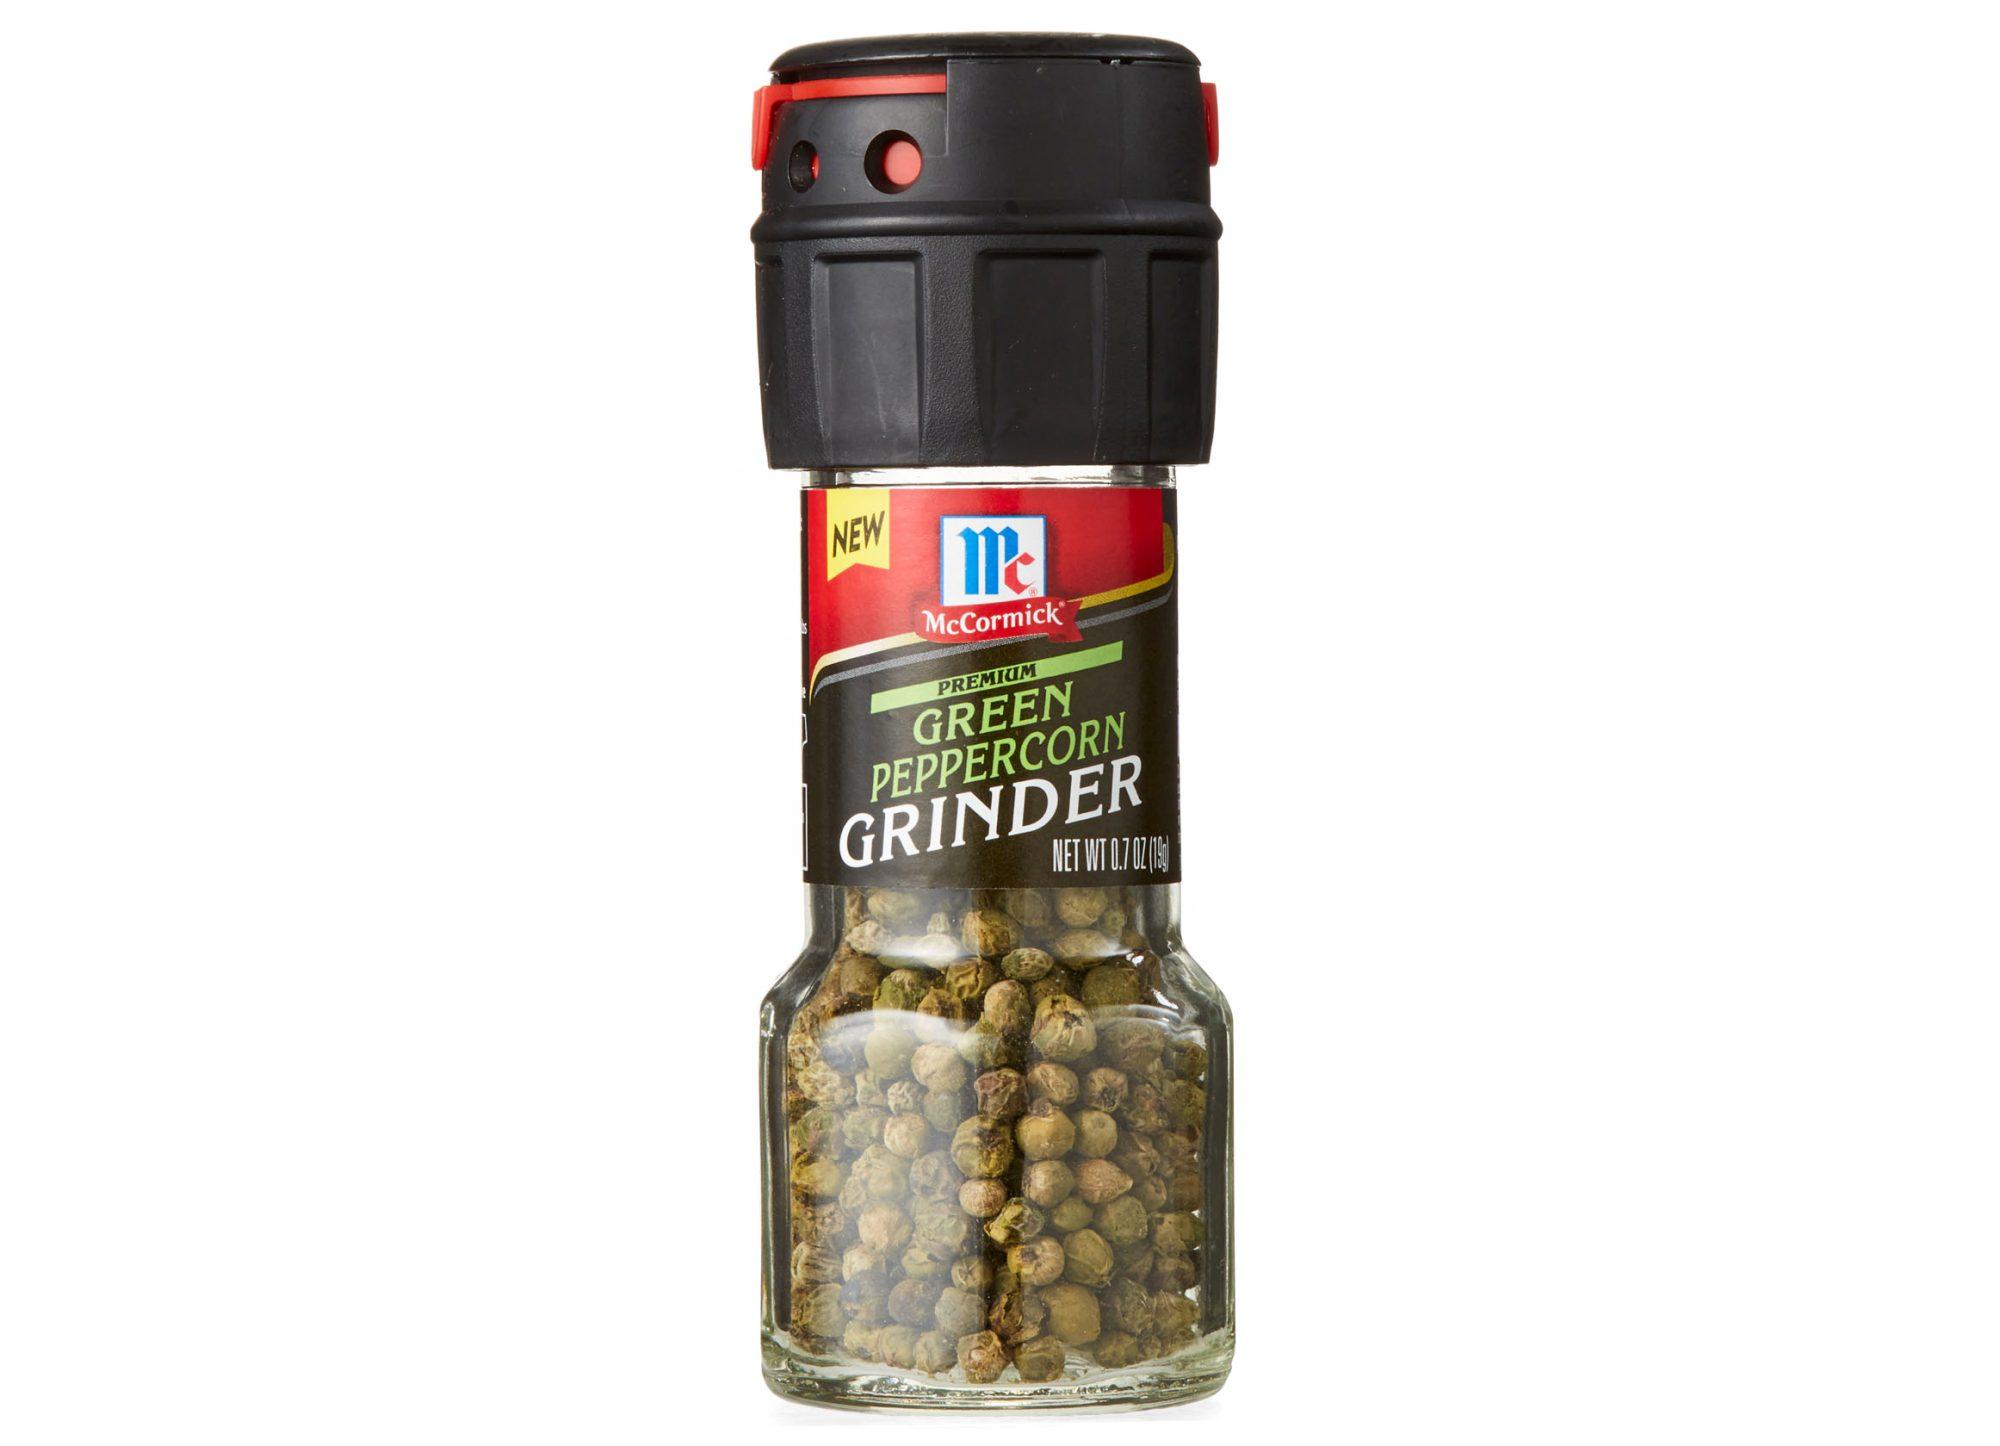 mccormick green peppercorn grinder